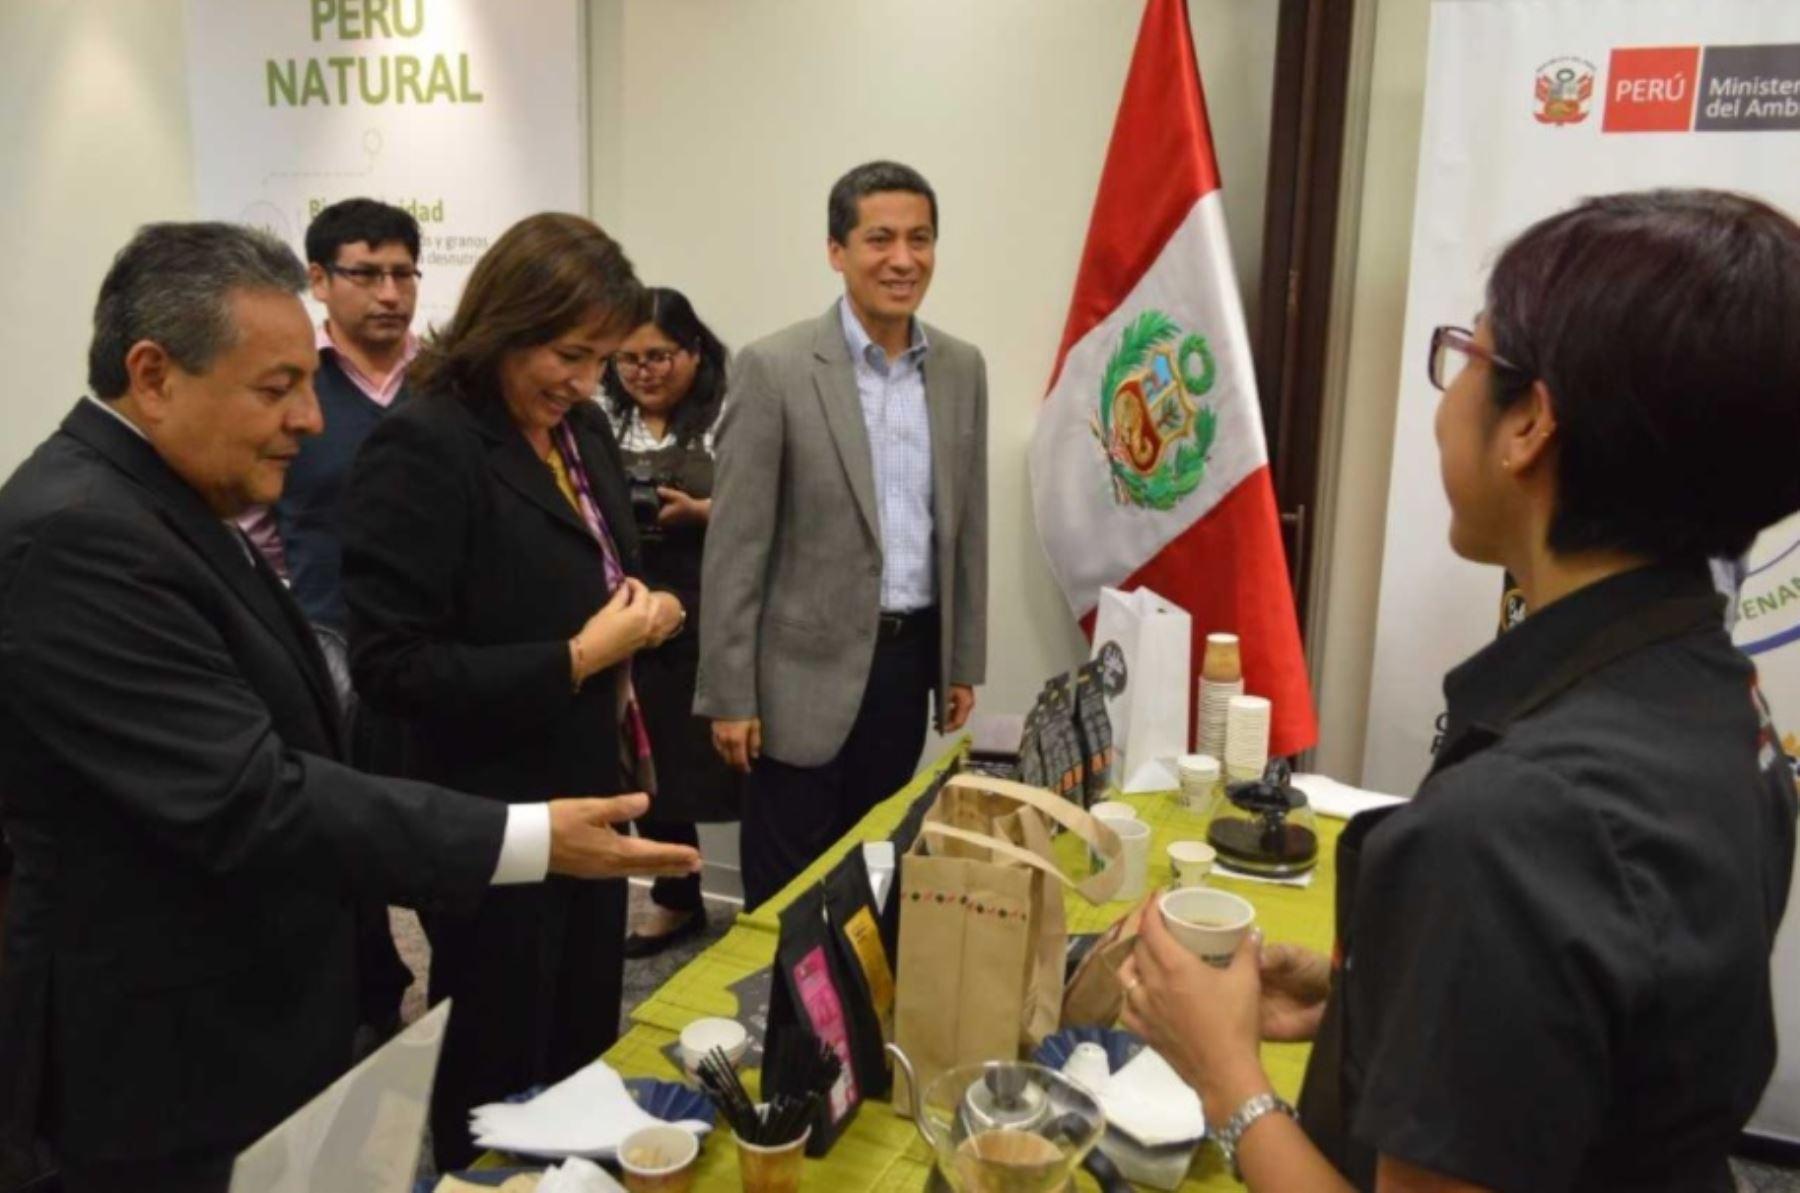 Ministerio del ambiente impulsa campa a cafetea per for Ministerio del interior donde queda